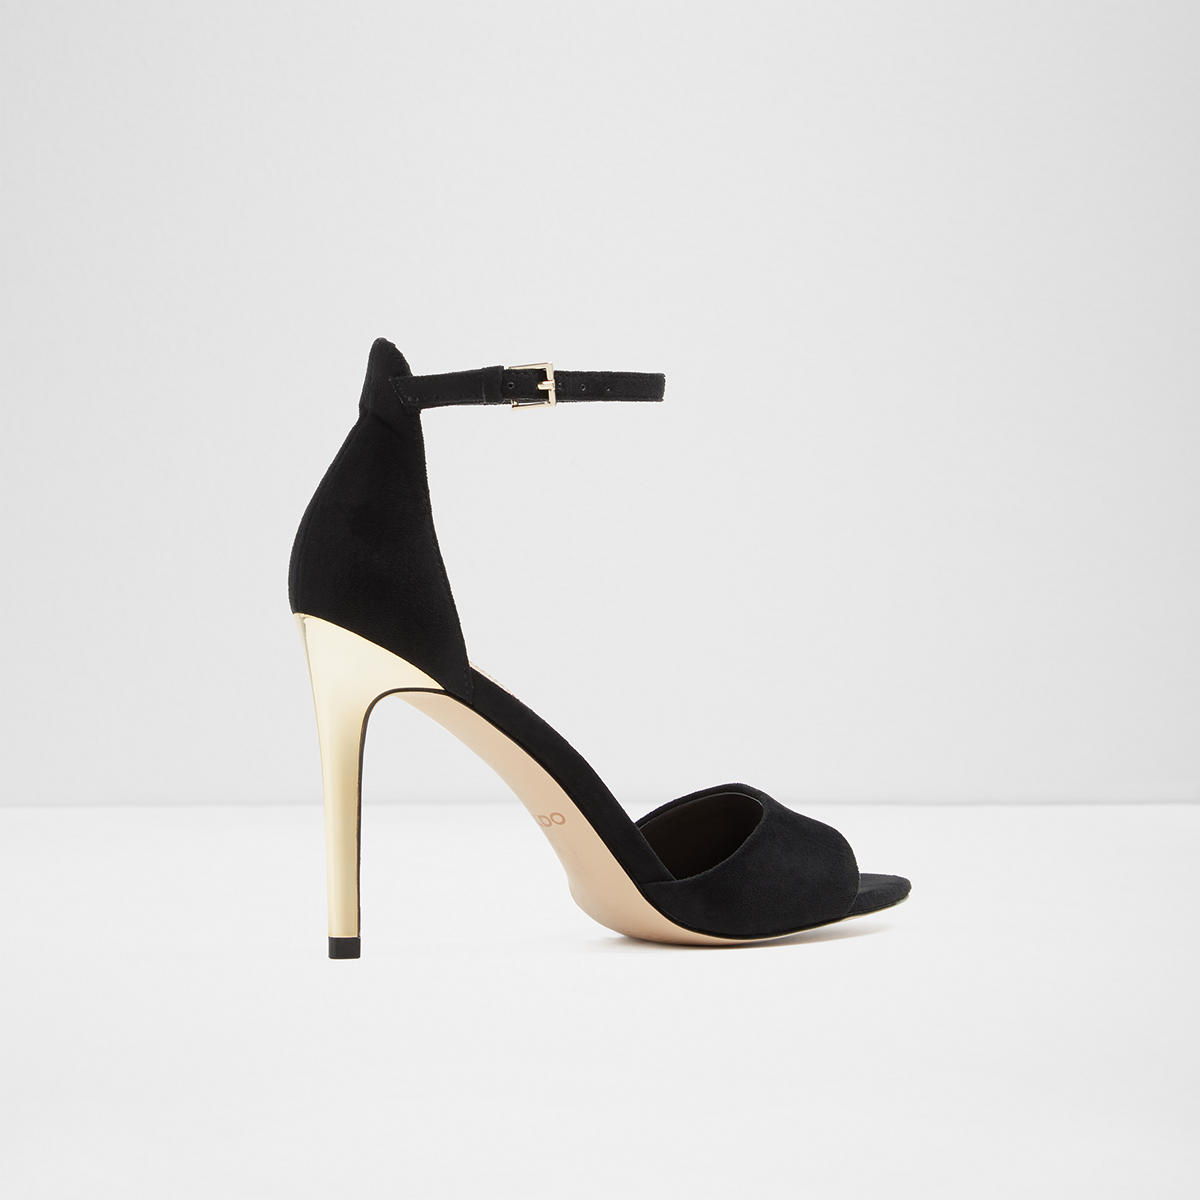 78d9d99716c Worster Midnight Black Women s Sandals